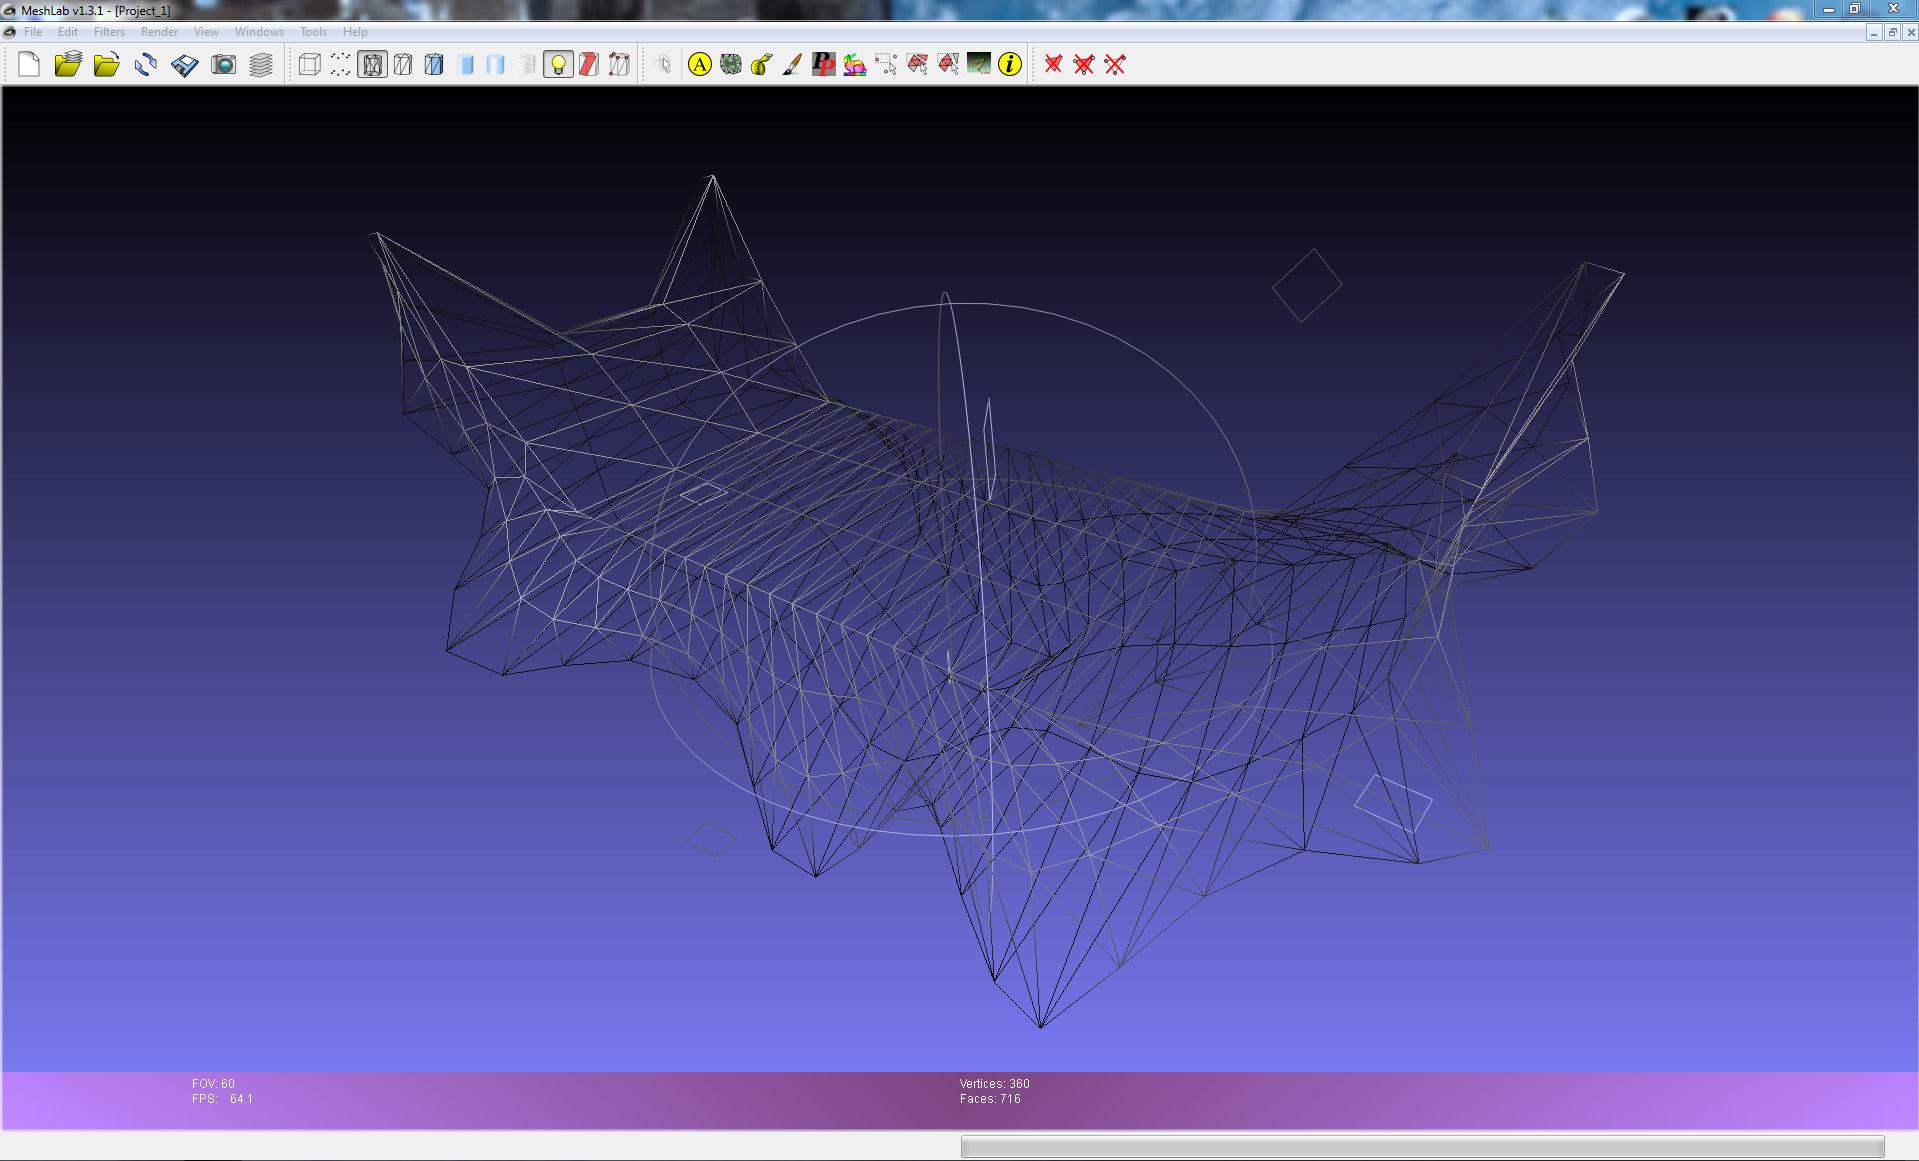 GreenSpider - Grasshopper 3D models streamlined to Revit